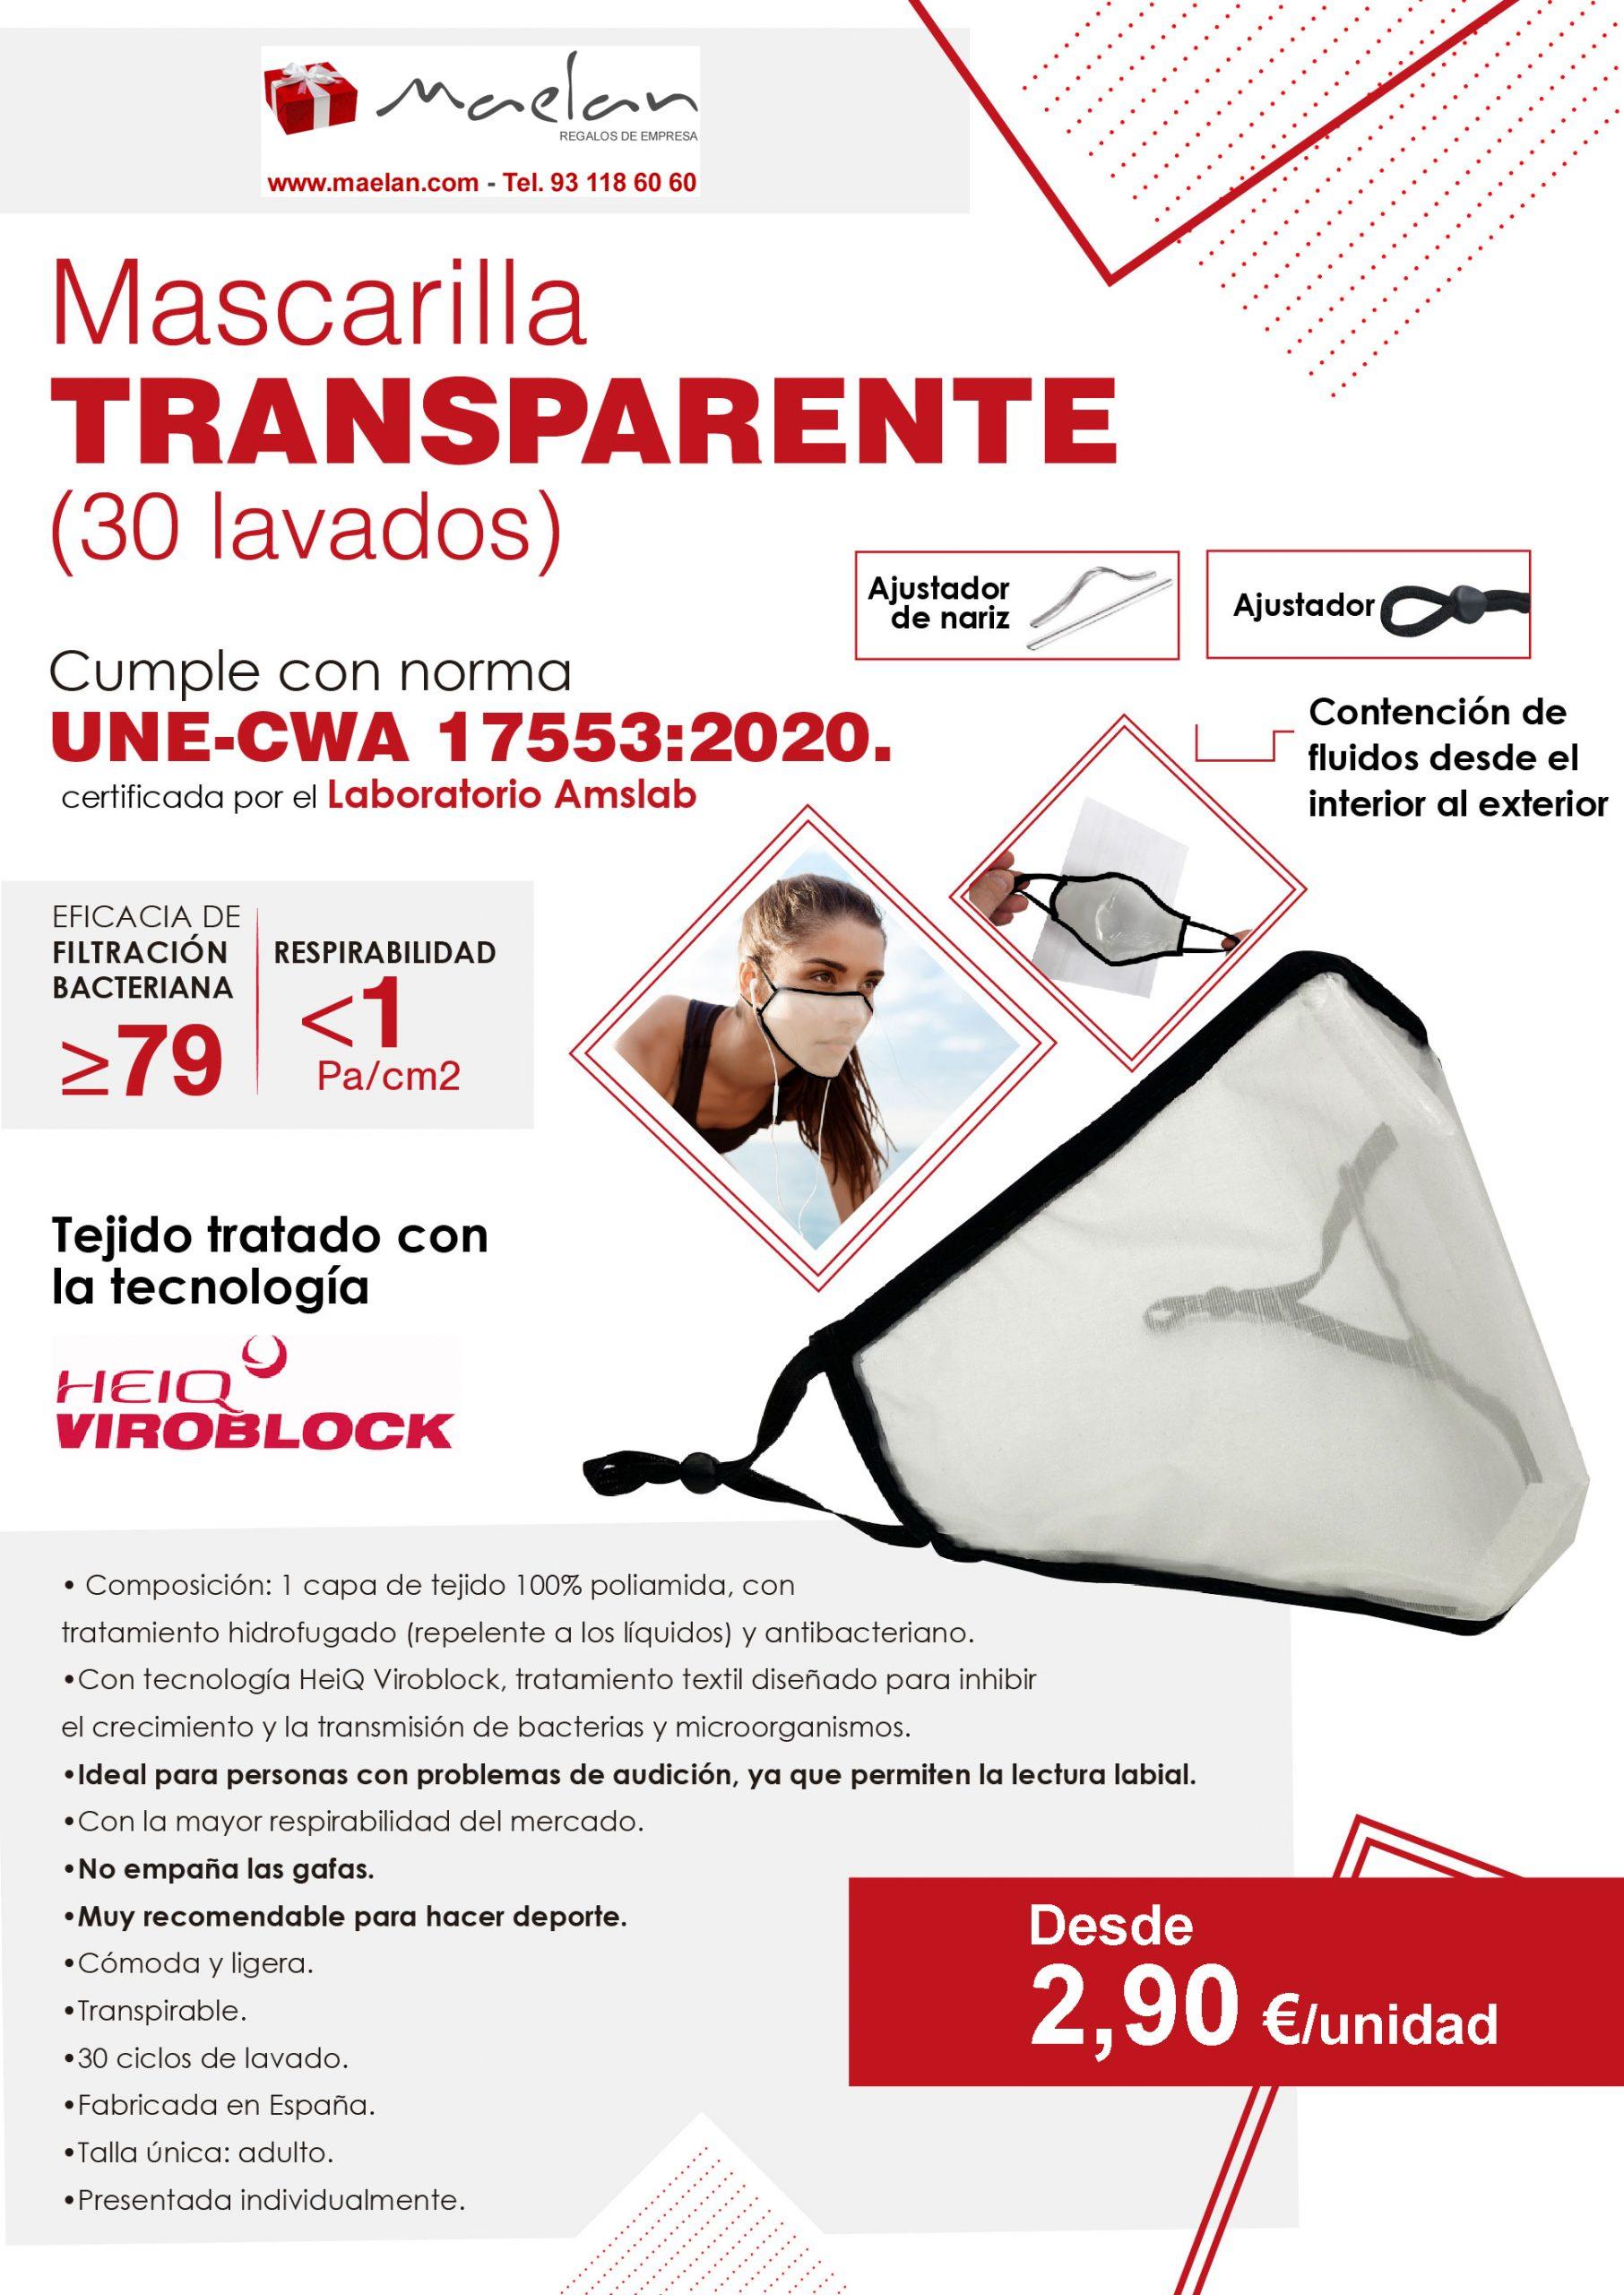 Oferta comercial mascarilla transparente